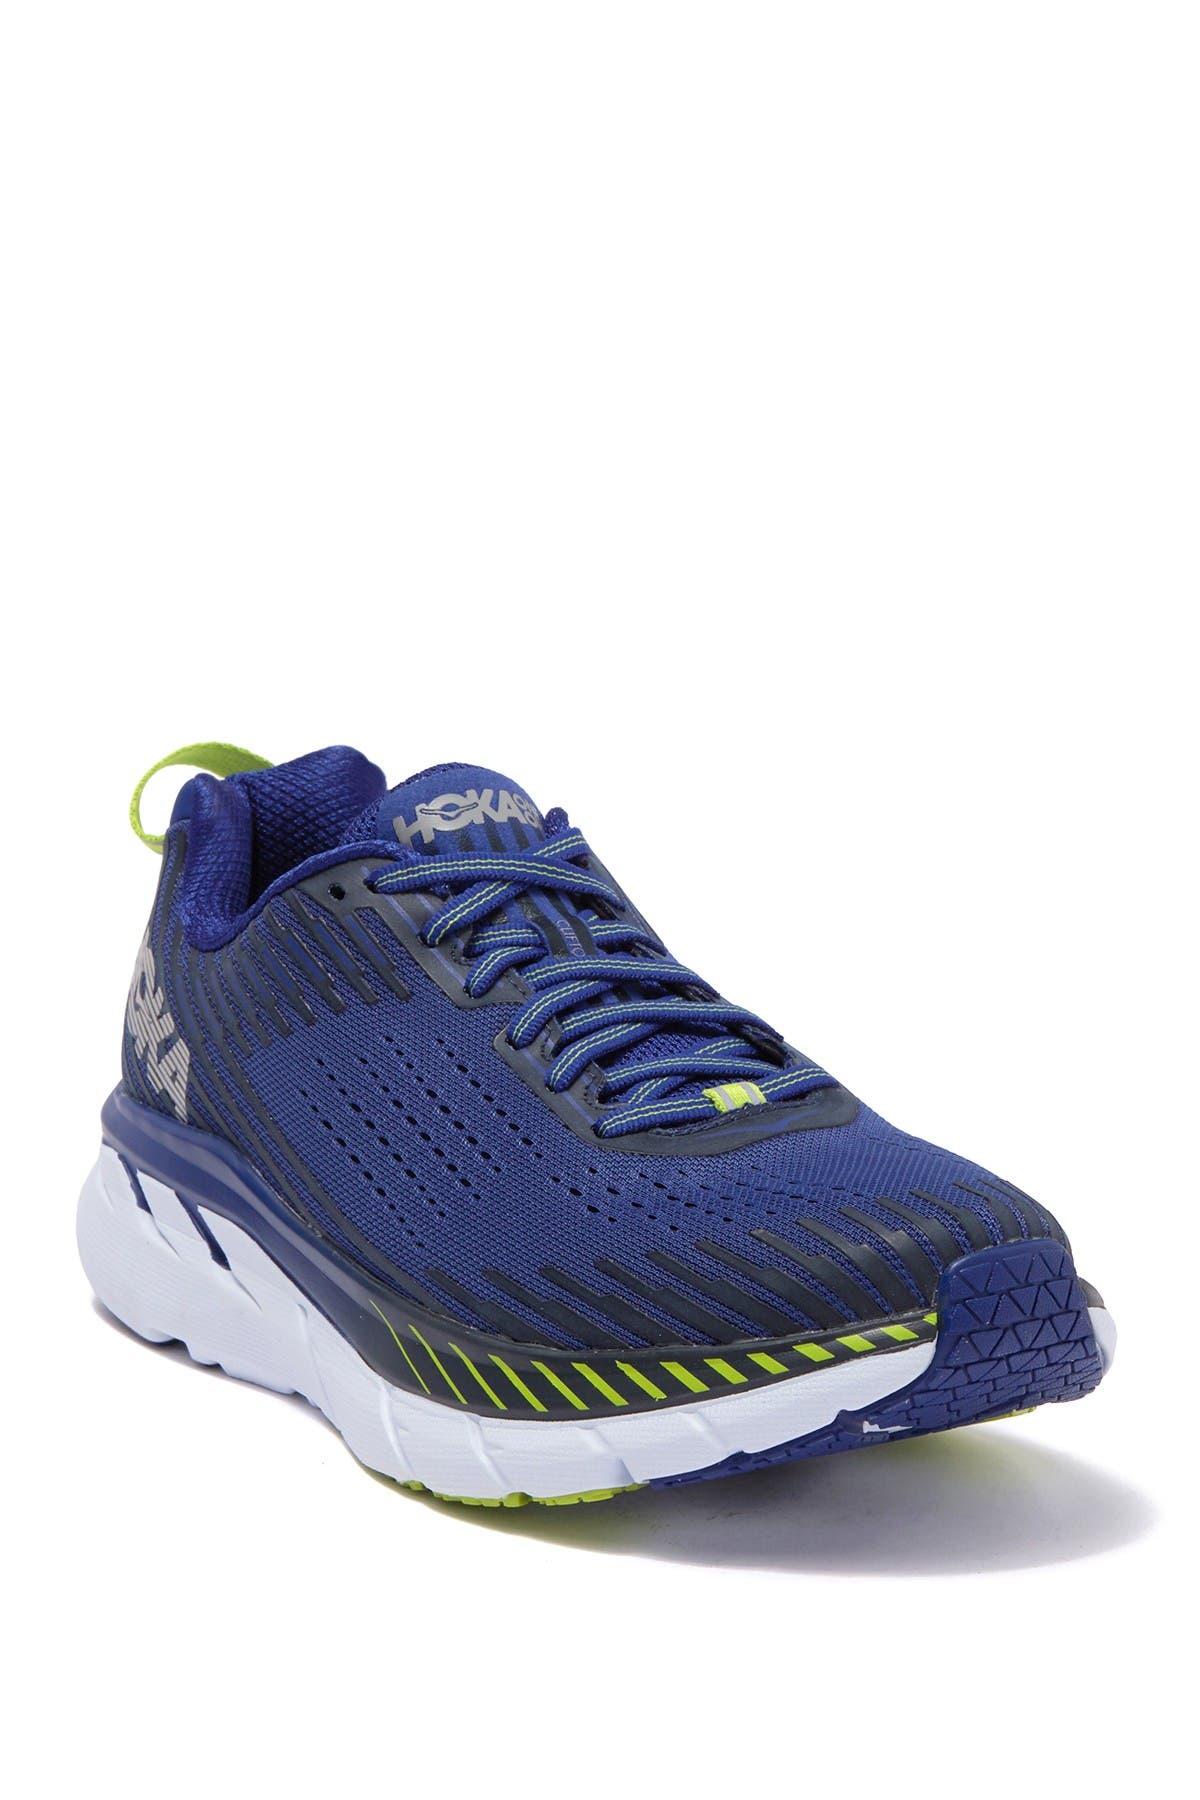 ONE | Clifton Running Shoe | Nordstrom Rack